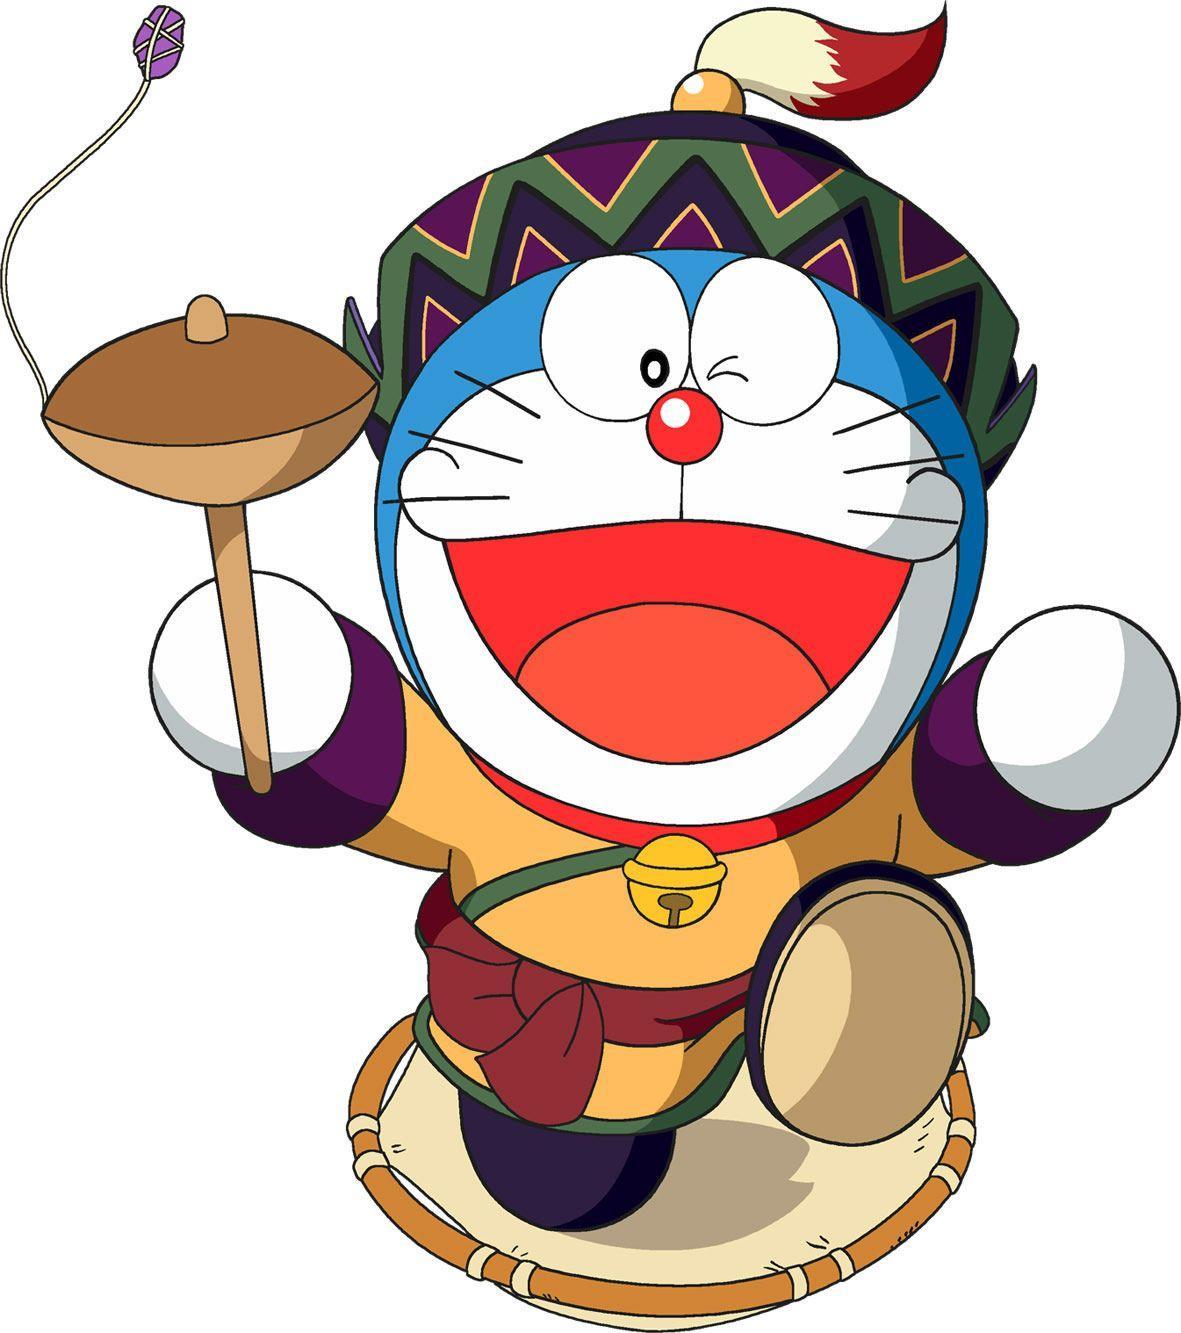 1181x1333 Doraemon (Nhân vật) - Bảng hình ảnh Anime Zerochan